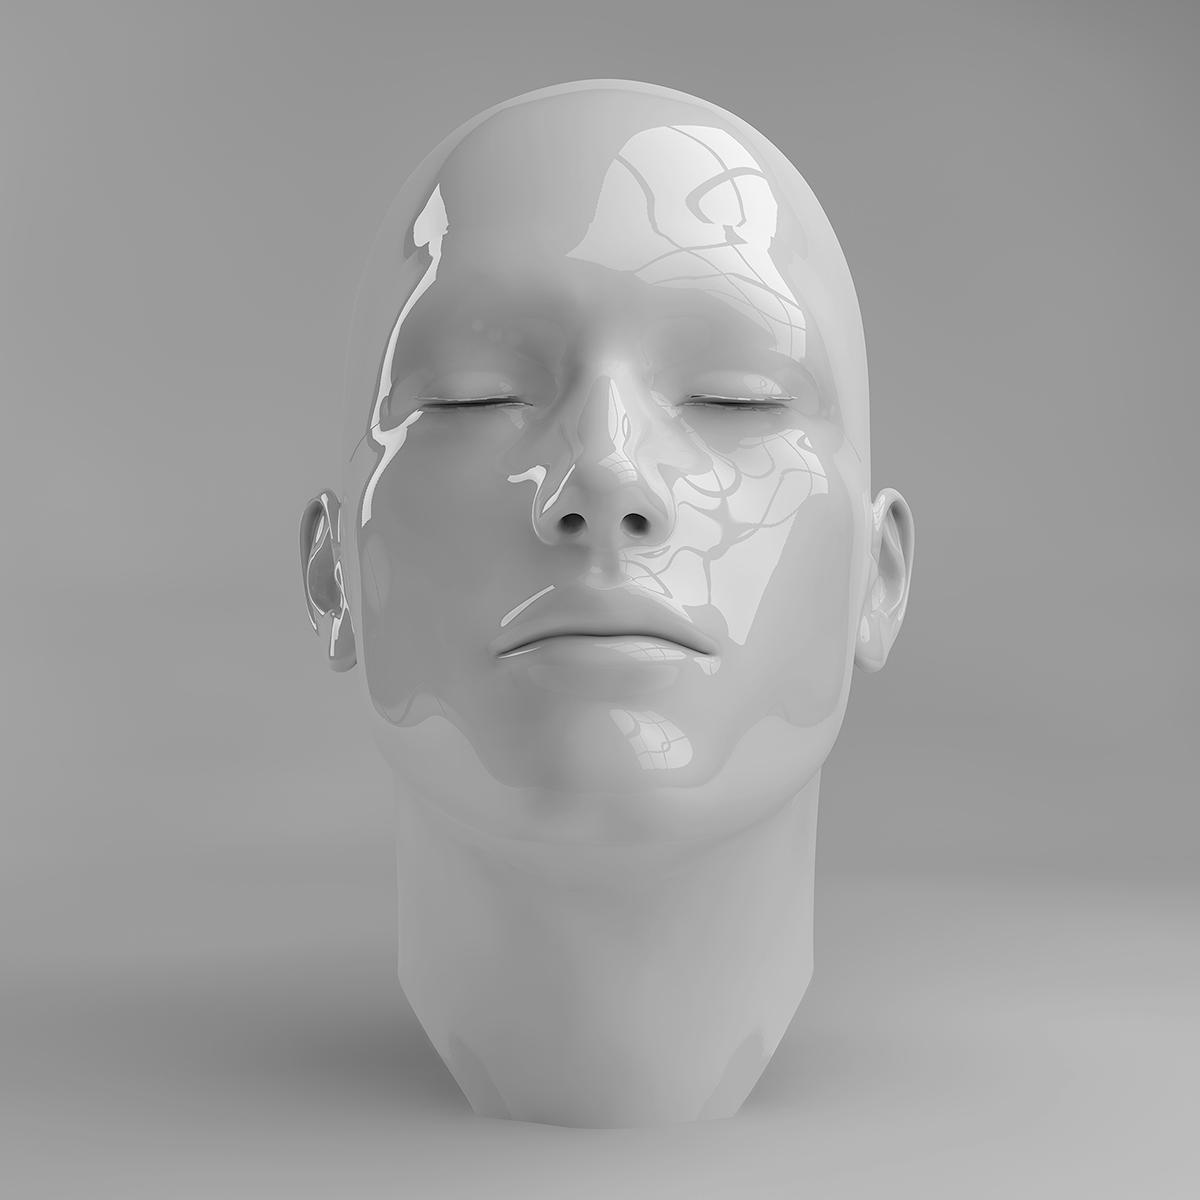 350 2011 eternal heads 001 resume high tty art - Resume - High Definition